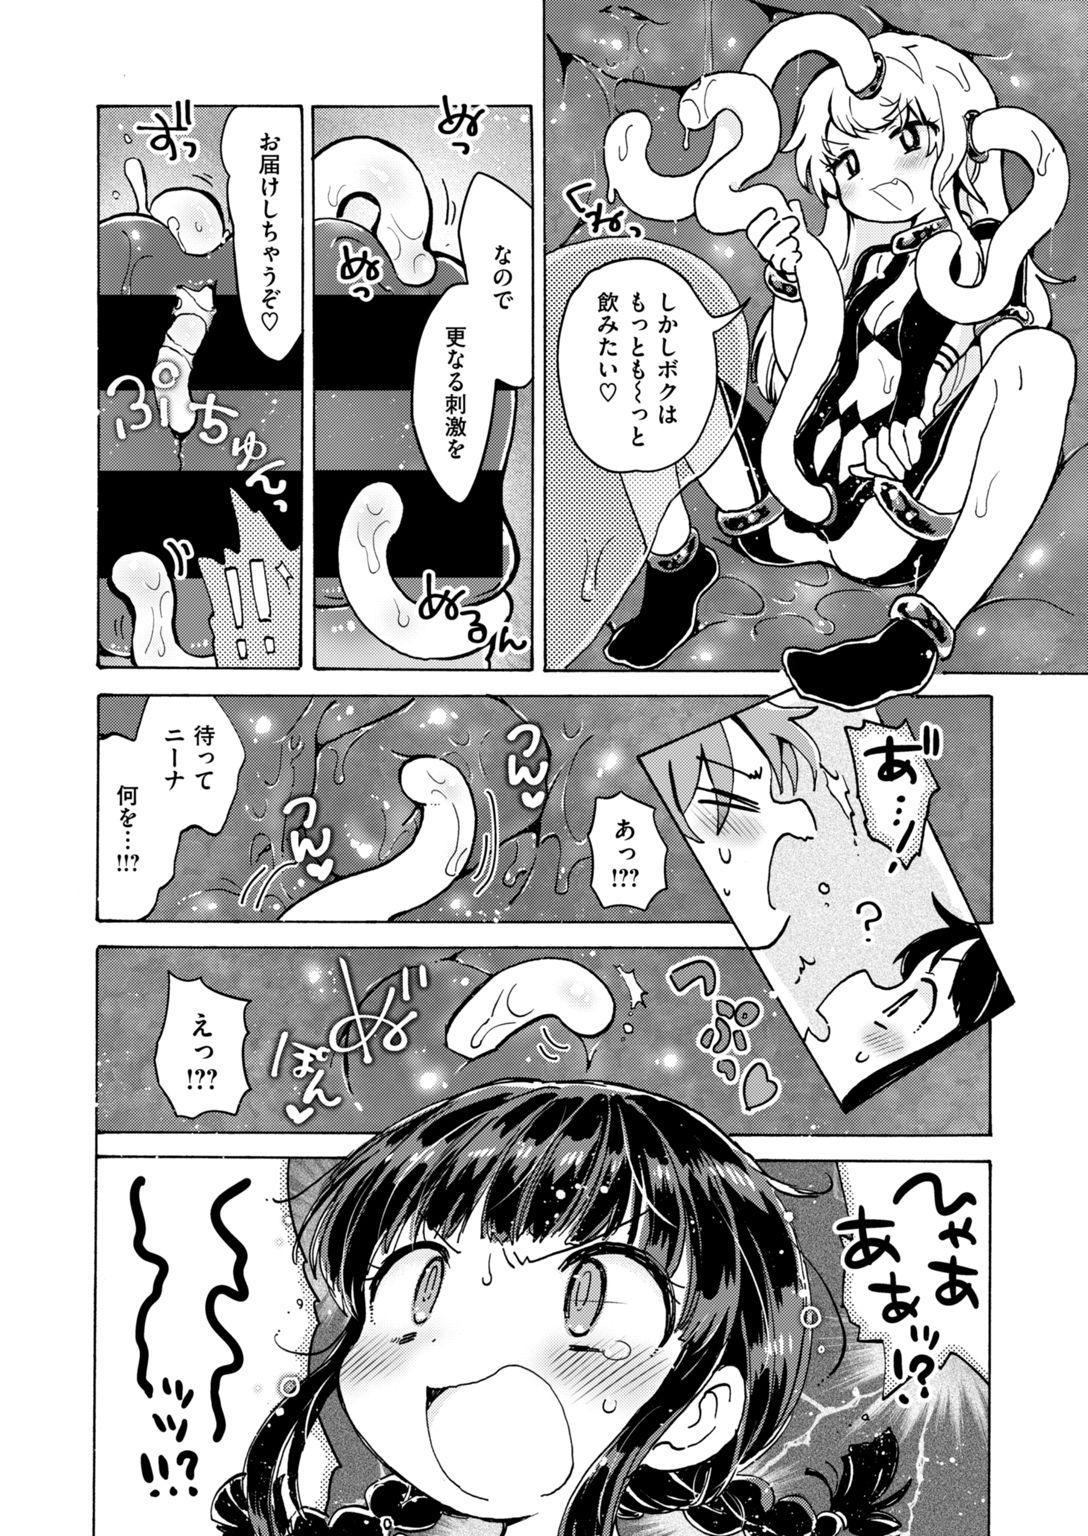 COMIC HAPPINING Vol. 2 26